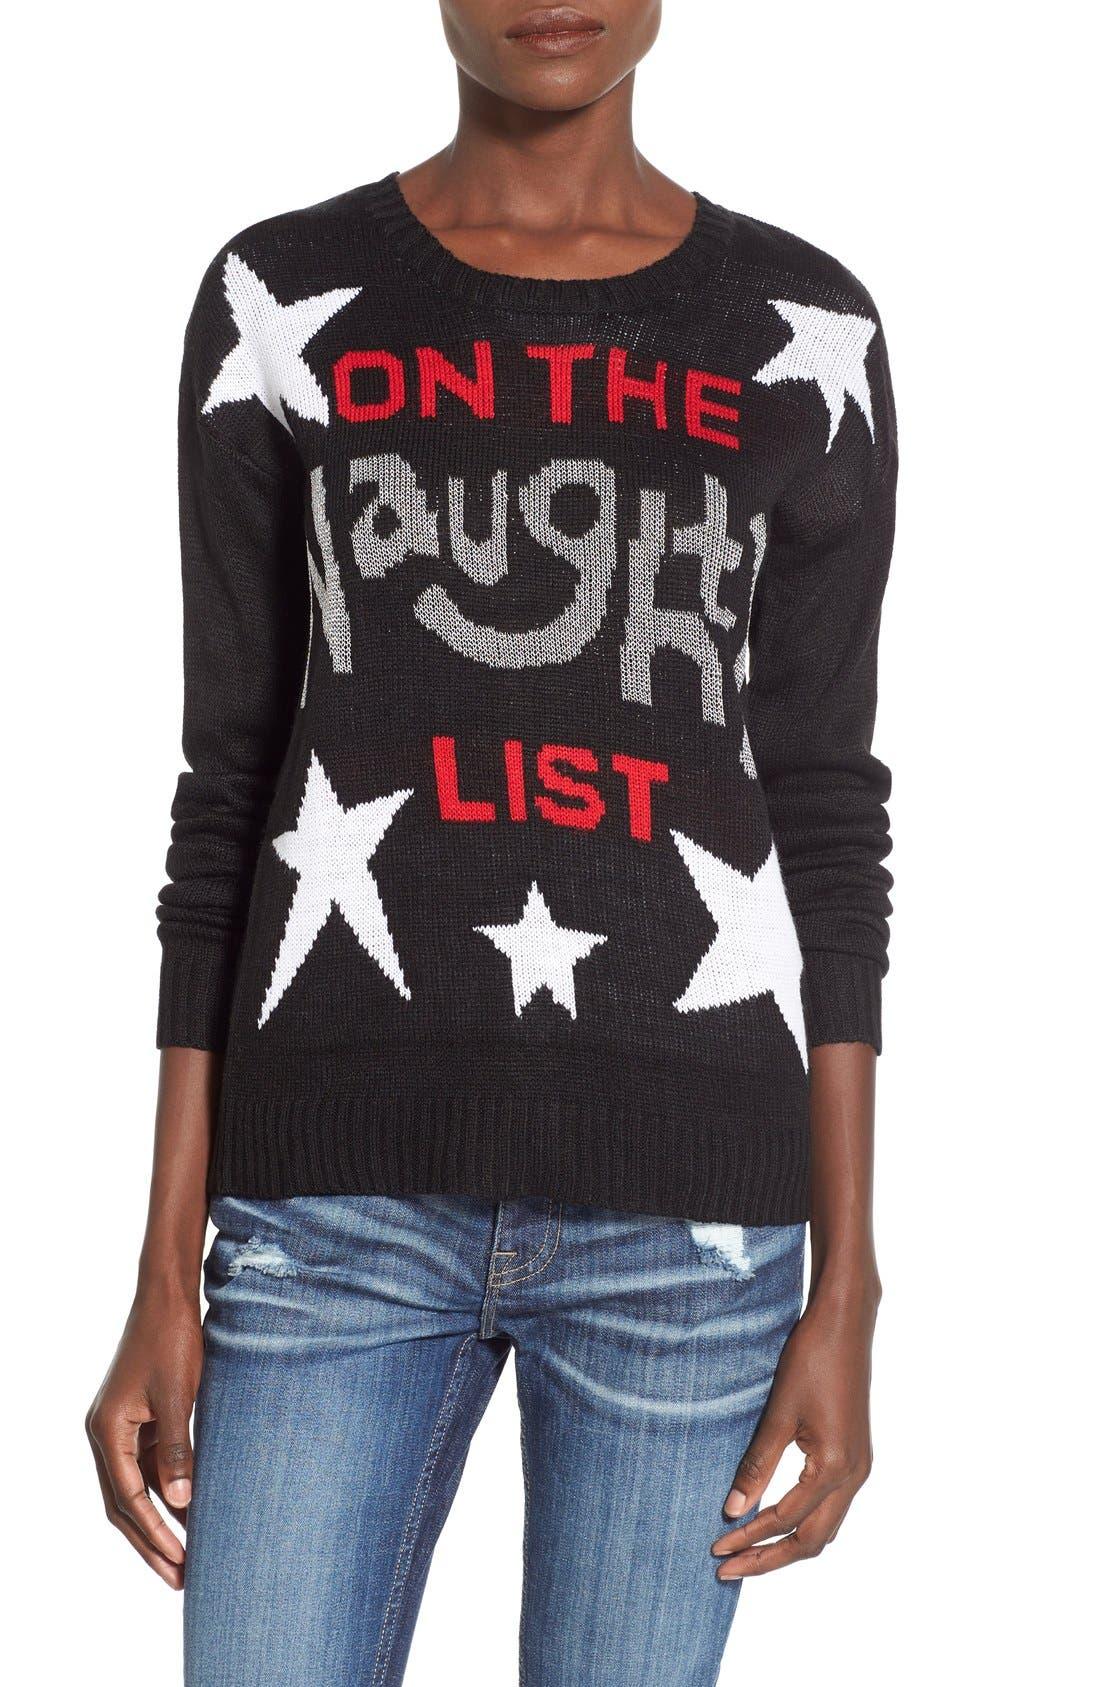 Main Image - Derek Heart 'Naughty List' Christmas Sweater